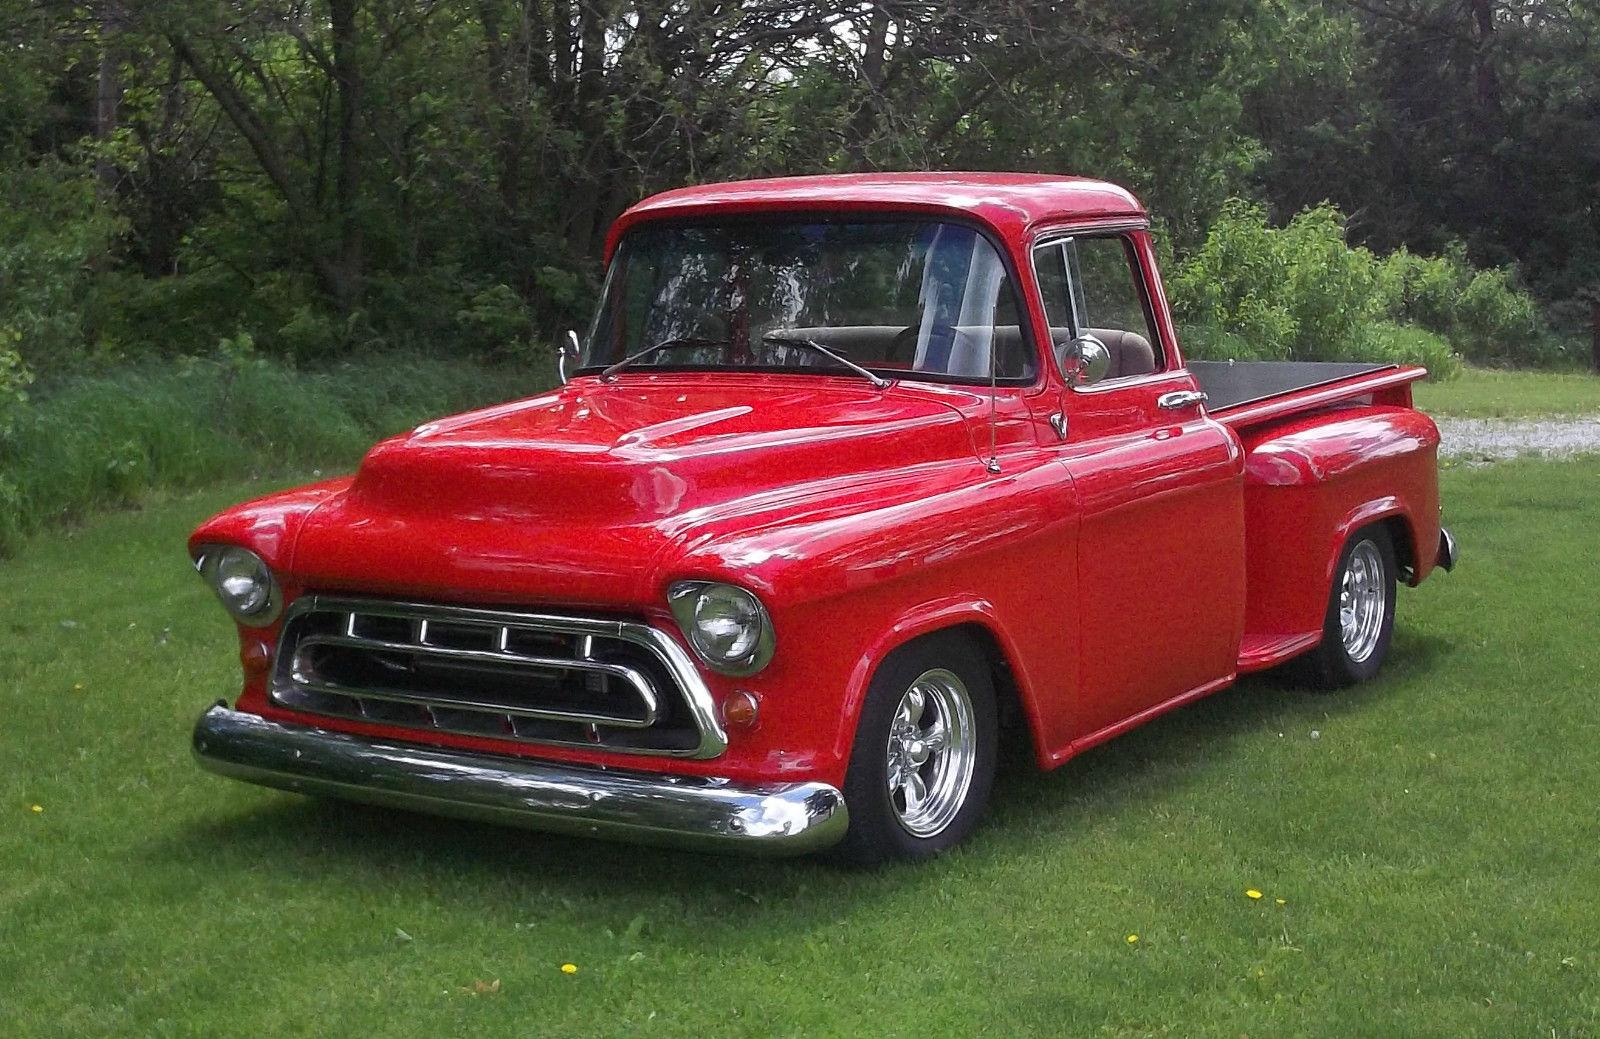 1957 chevy truck ls1 pro touring hot rat rod ls 1 swap custom deluxe big window. Black Bedroom Furniture Sets. Home Design Ideas